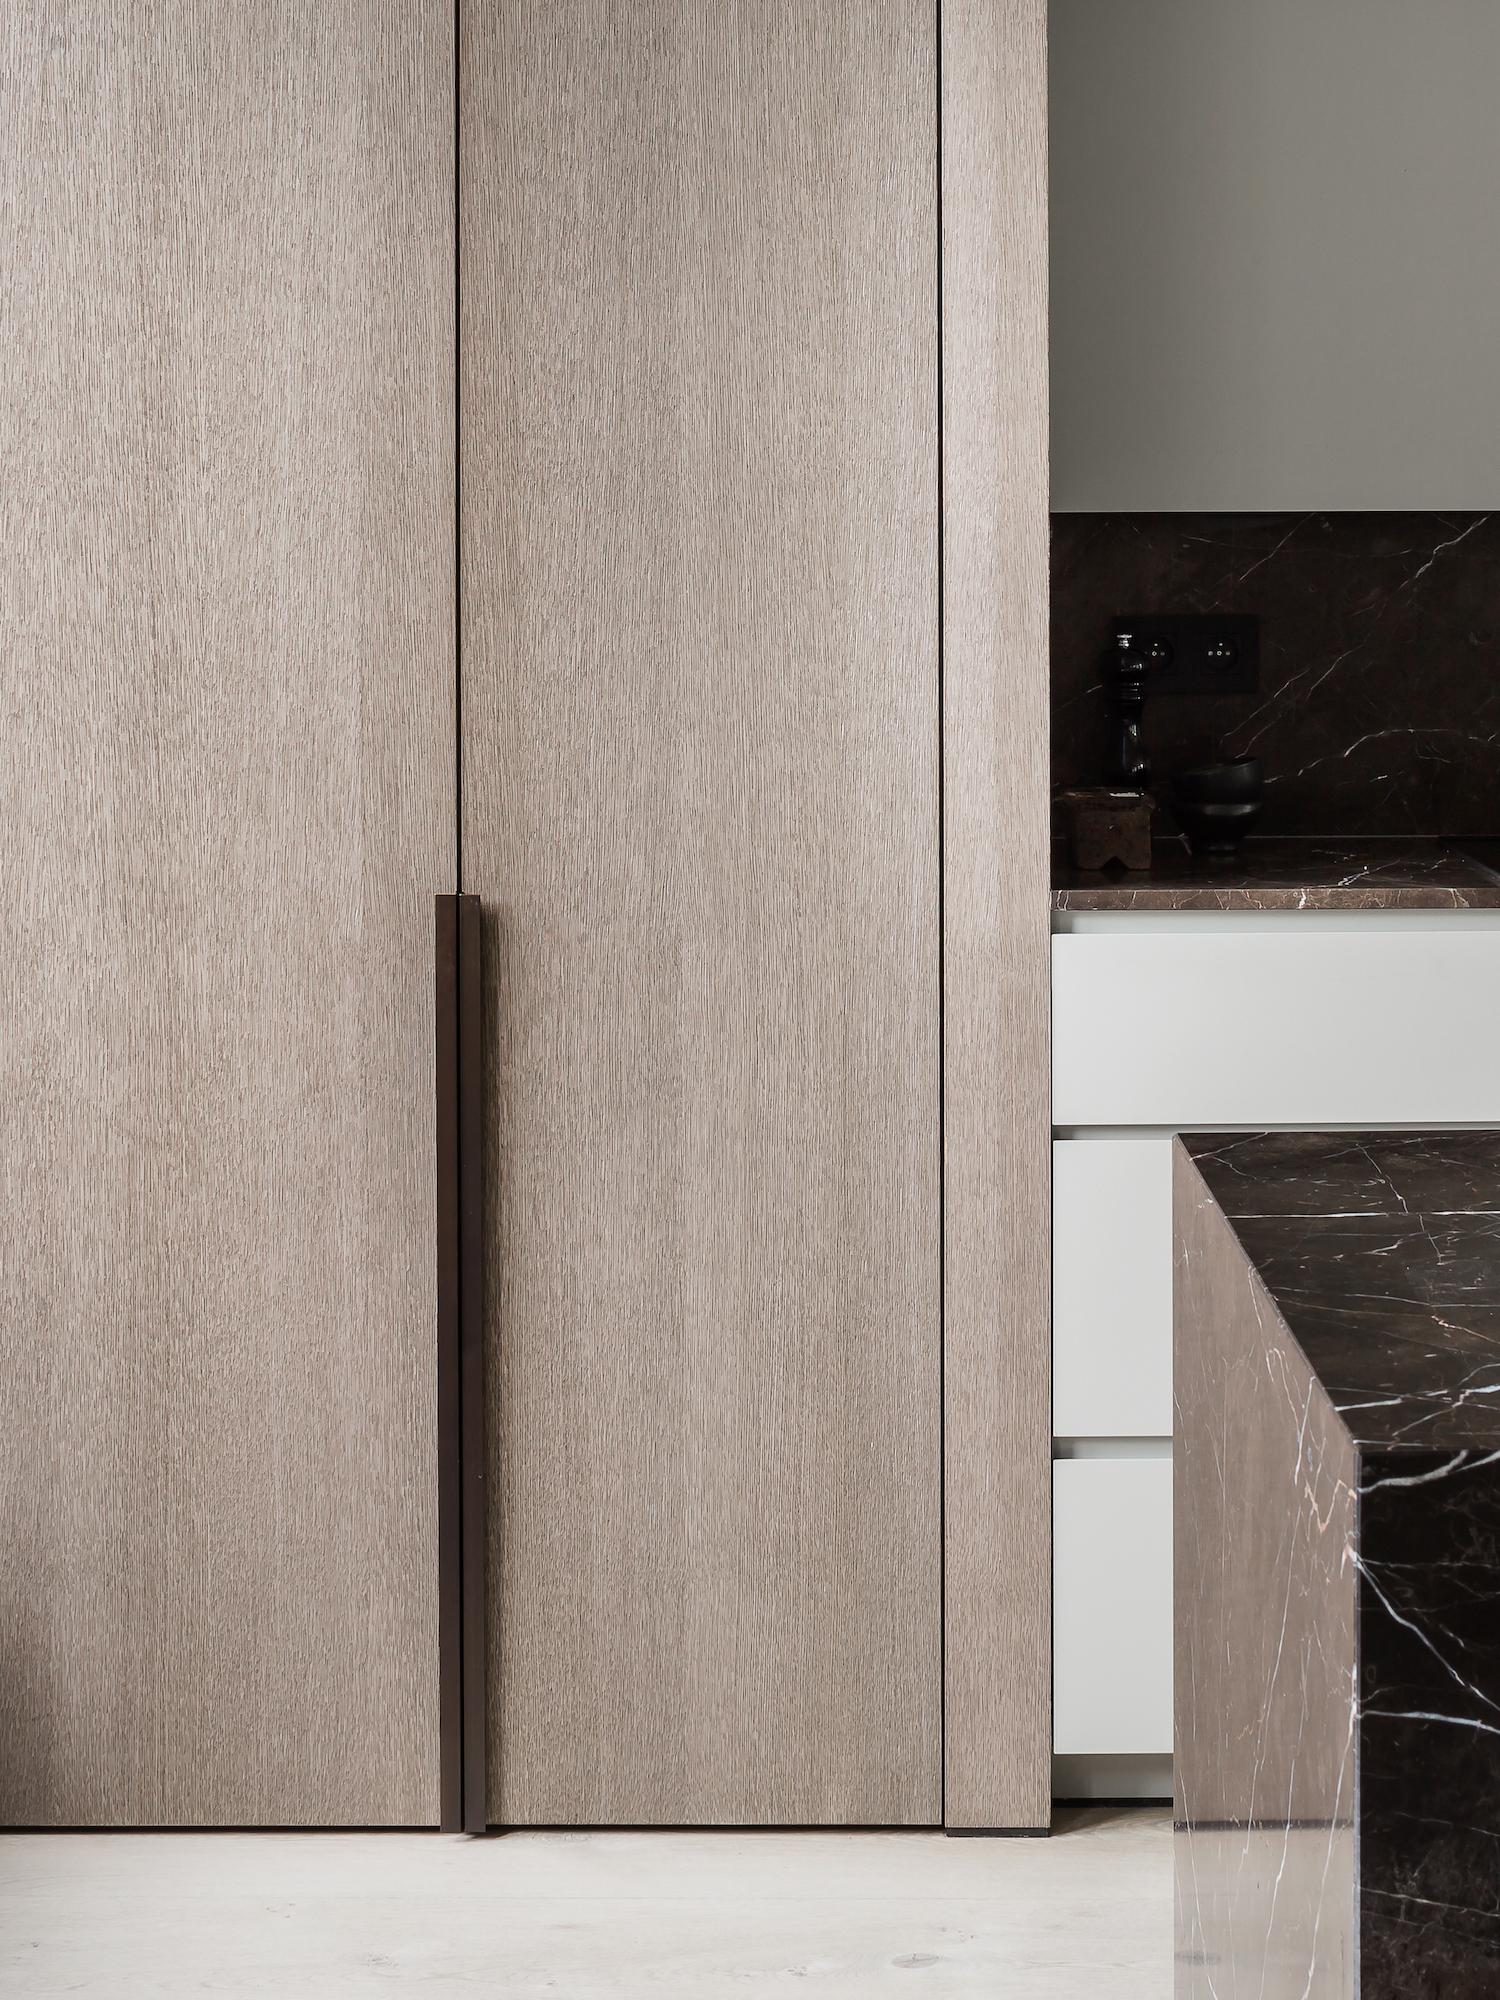 est living kitchen covet juma architects 1